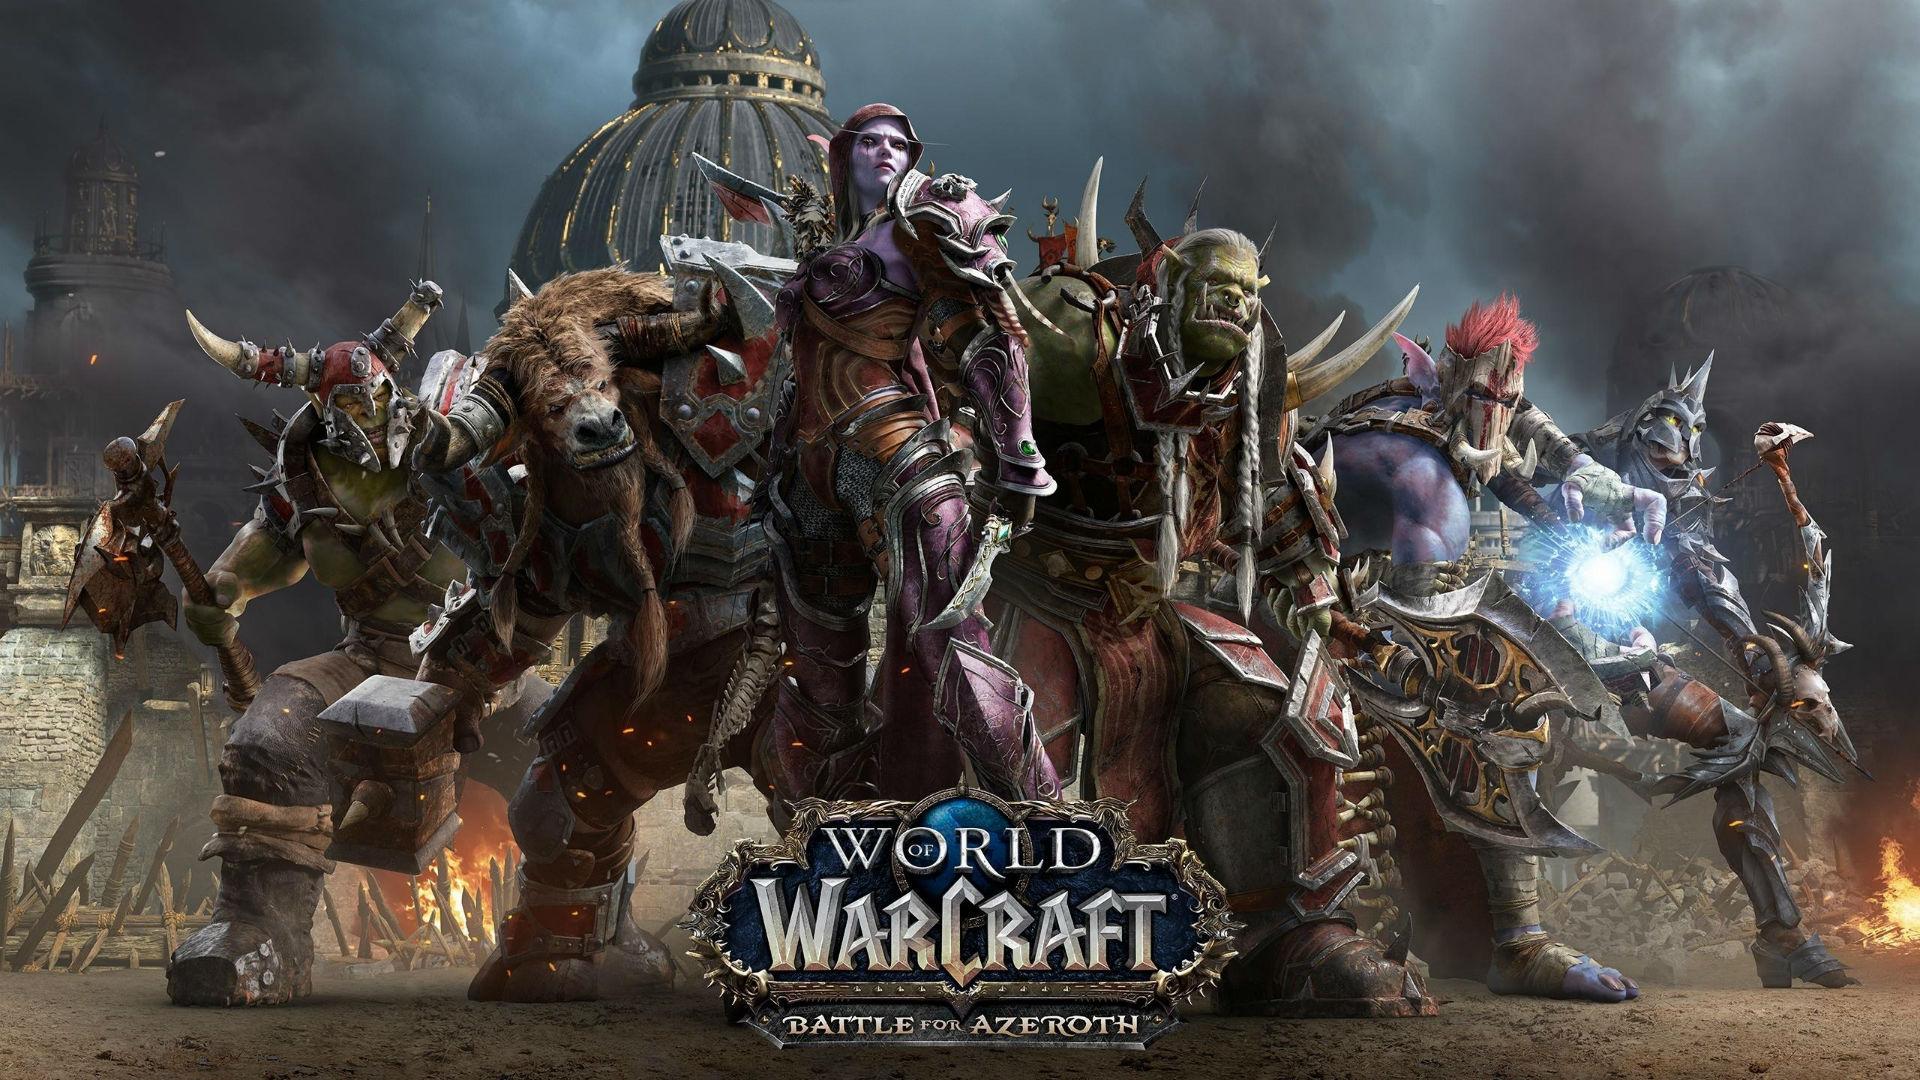 Battle for Azeroth snabbast säljande WoW-expansionen någonsin